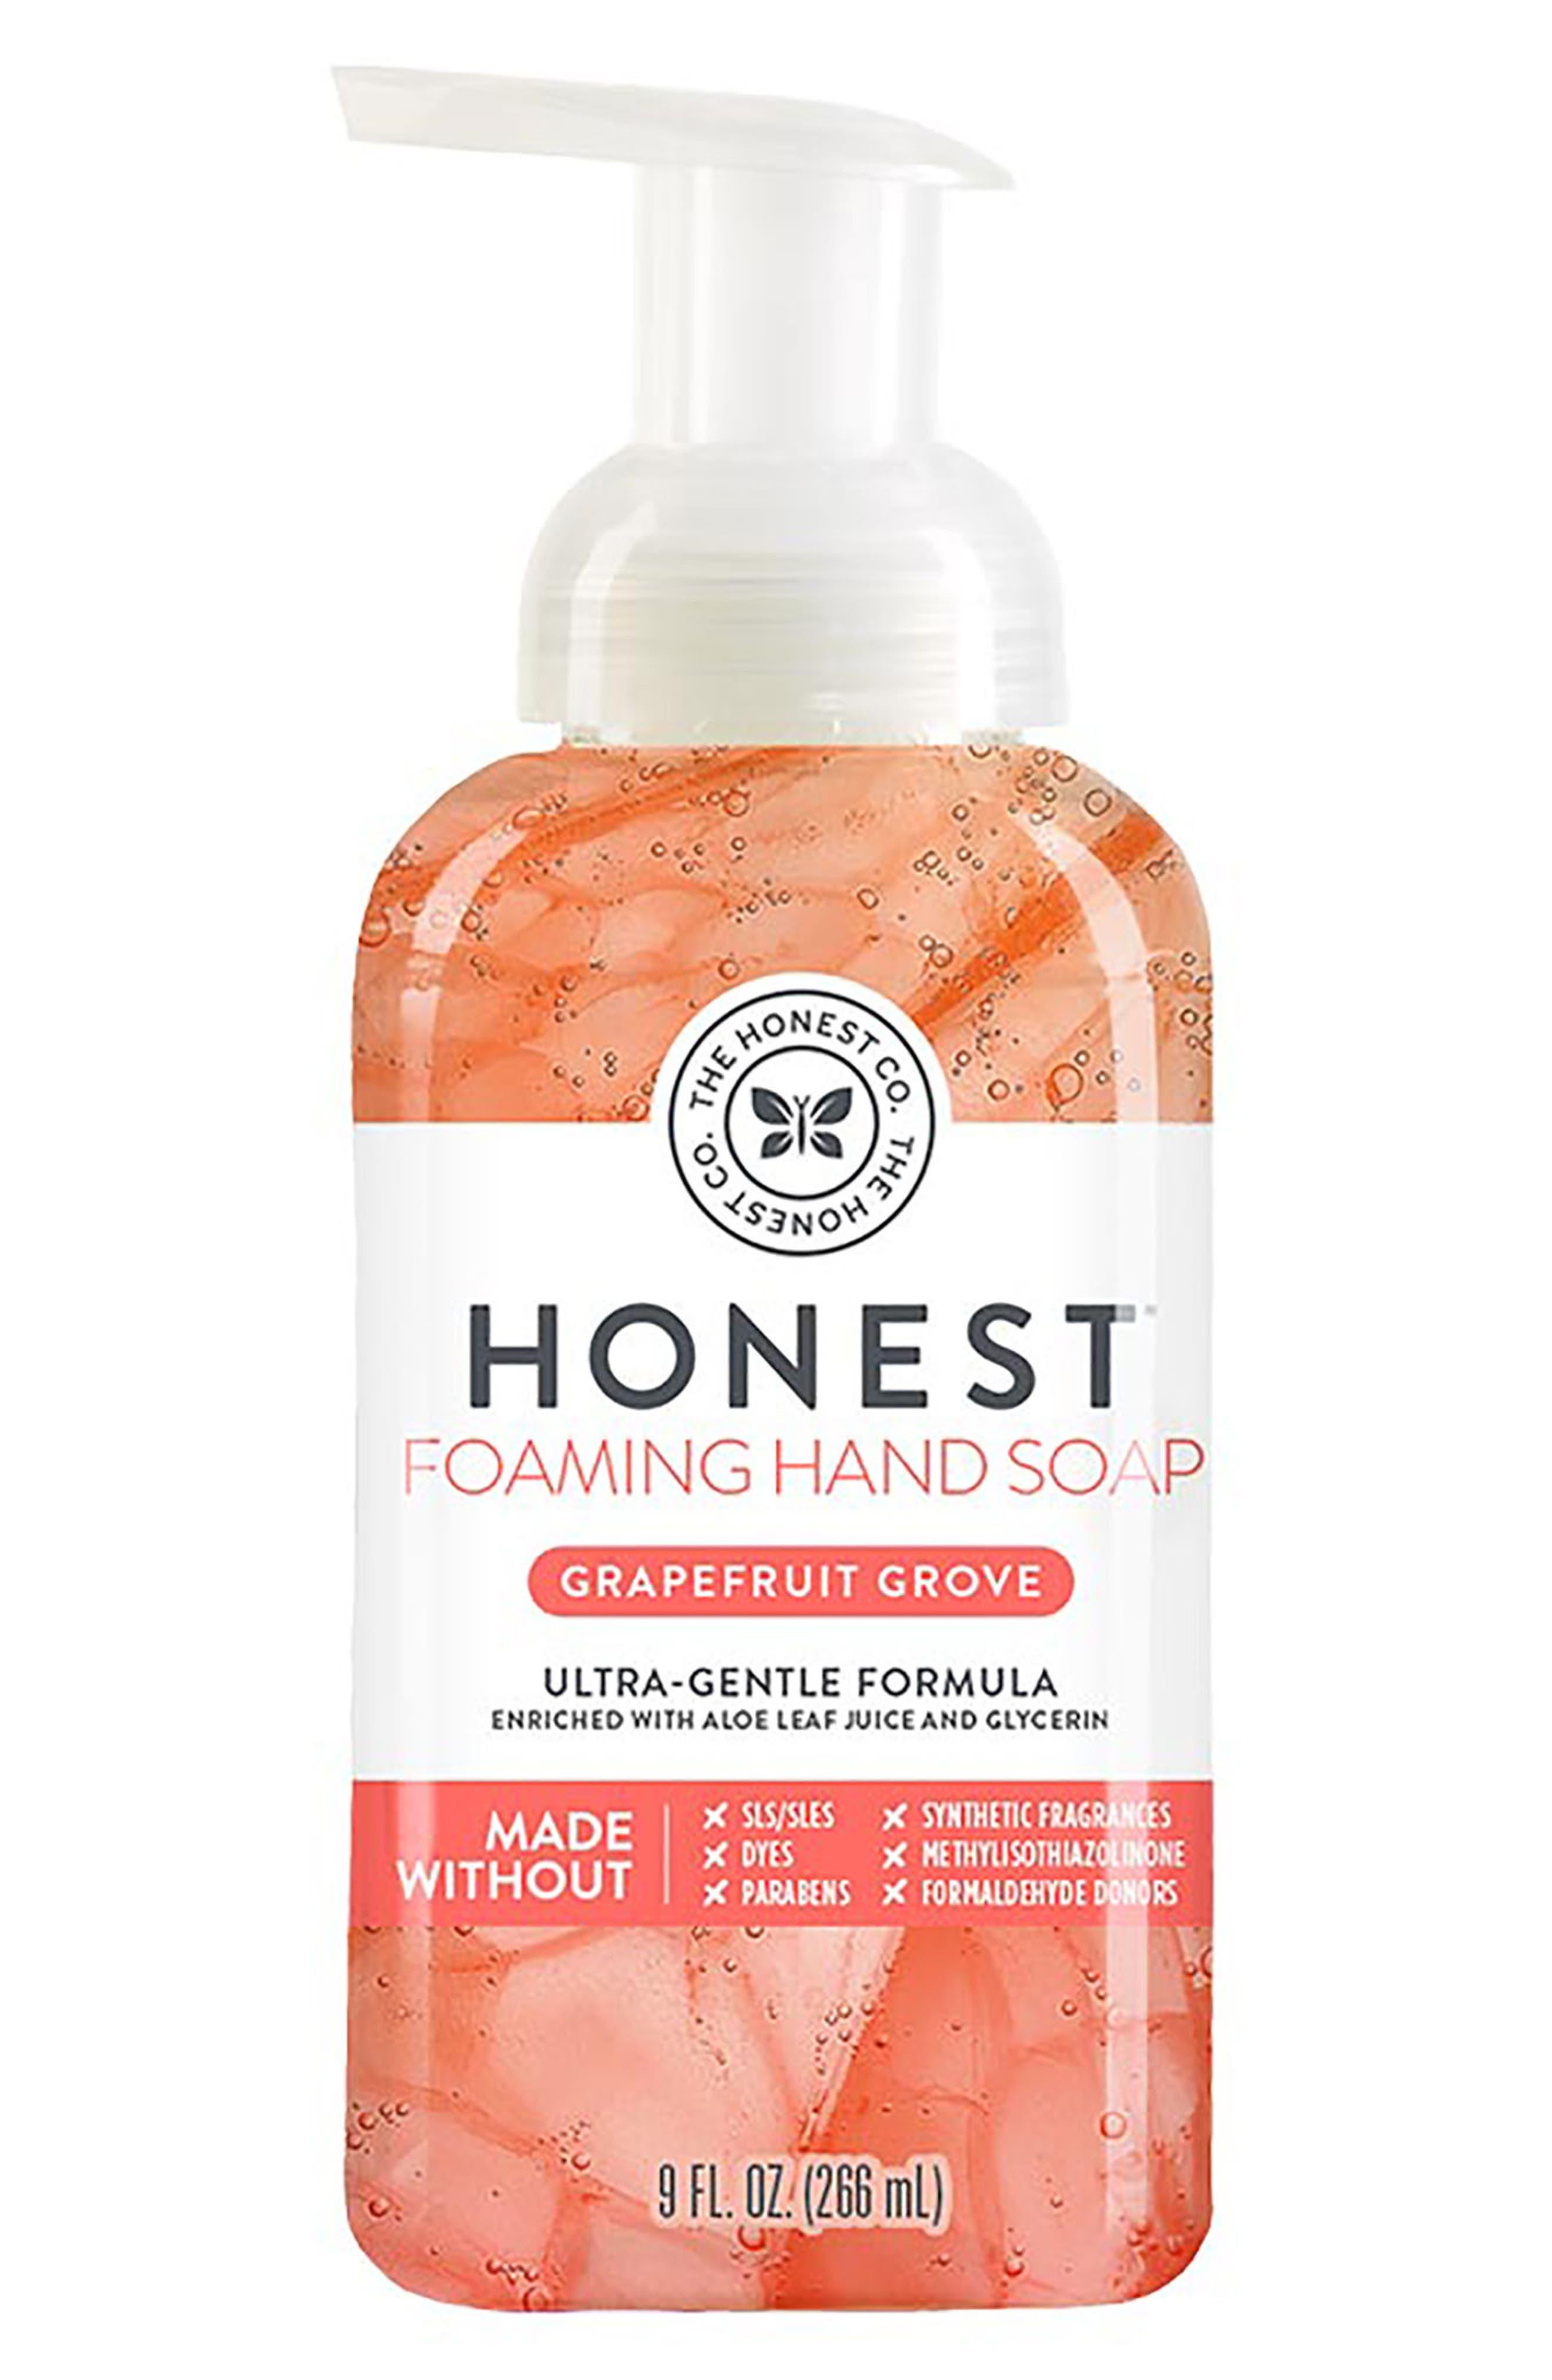 The Honest Company Grapefruit Grove Foaming Hand Soap